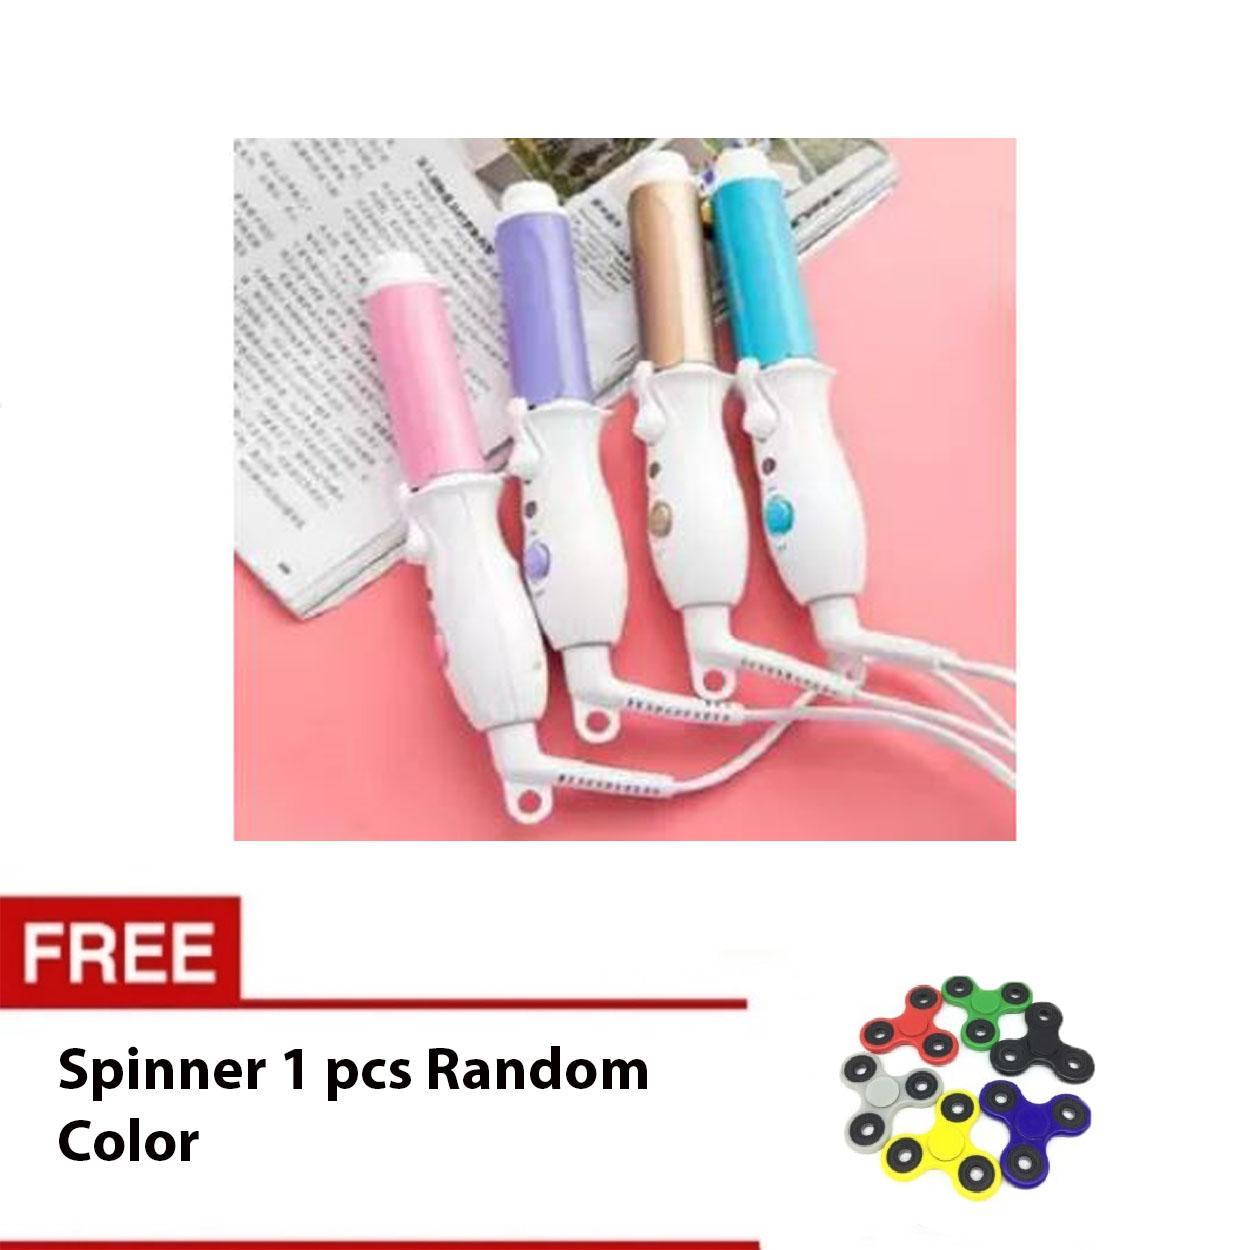 Aiueo Catok Mini Hair Curler Travel Mini Curler Chaozan Model XD-168 Random Color Bundling Spinner Biasa 1 Pcs Random Color